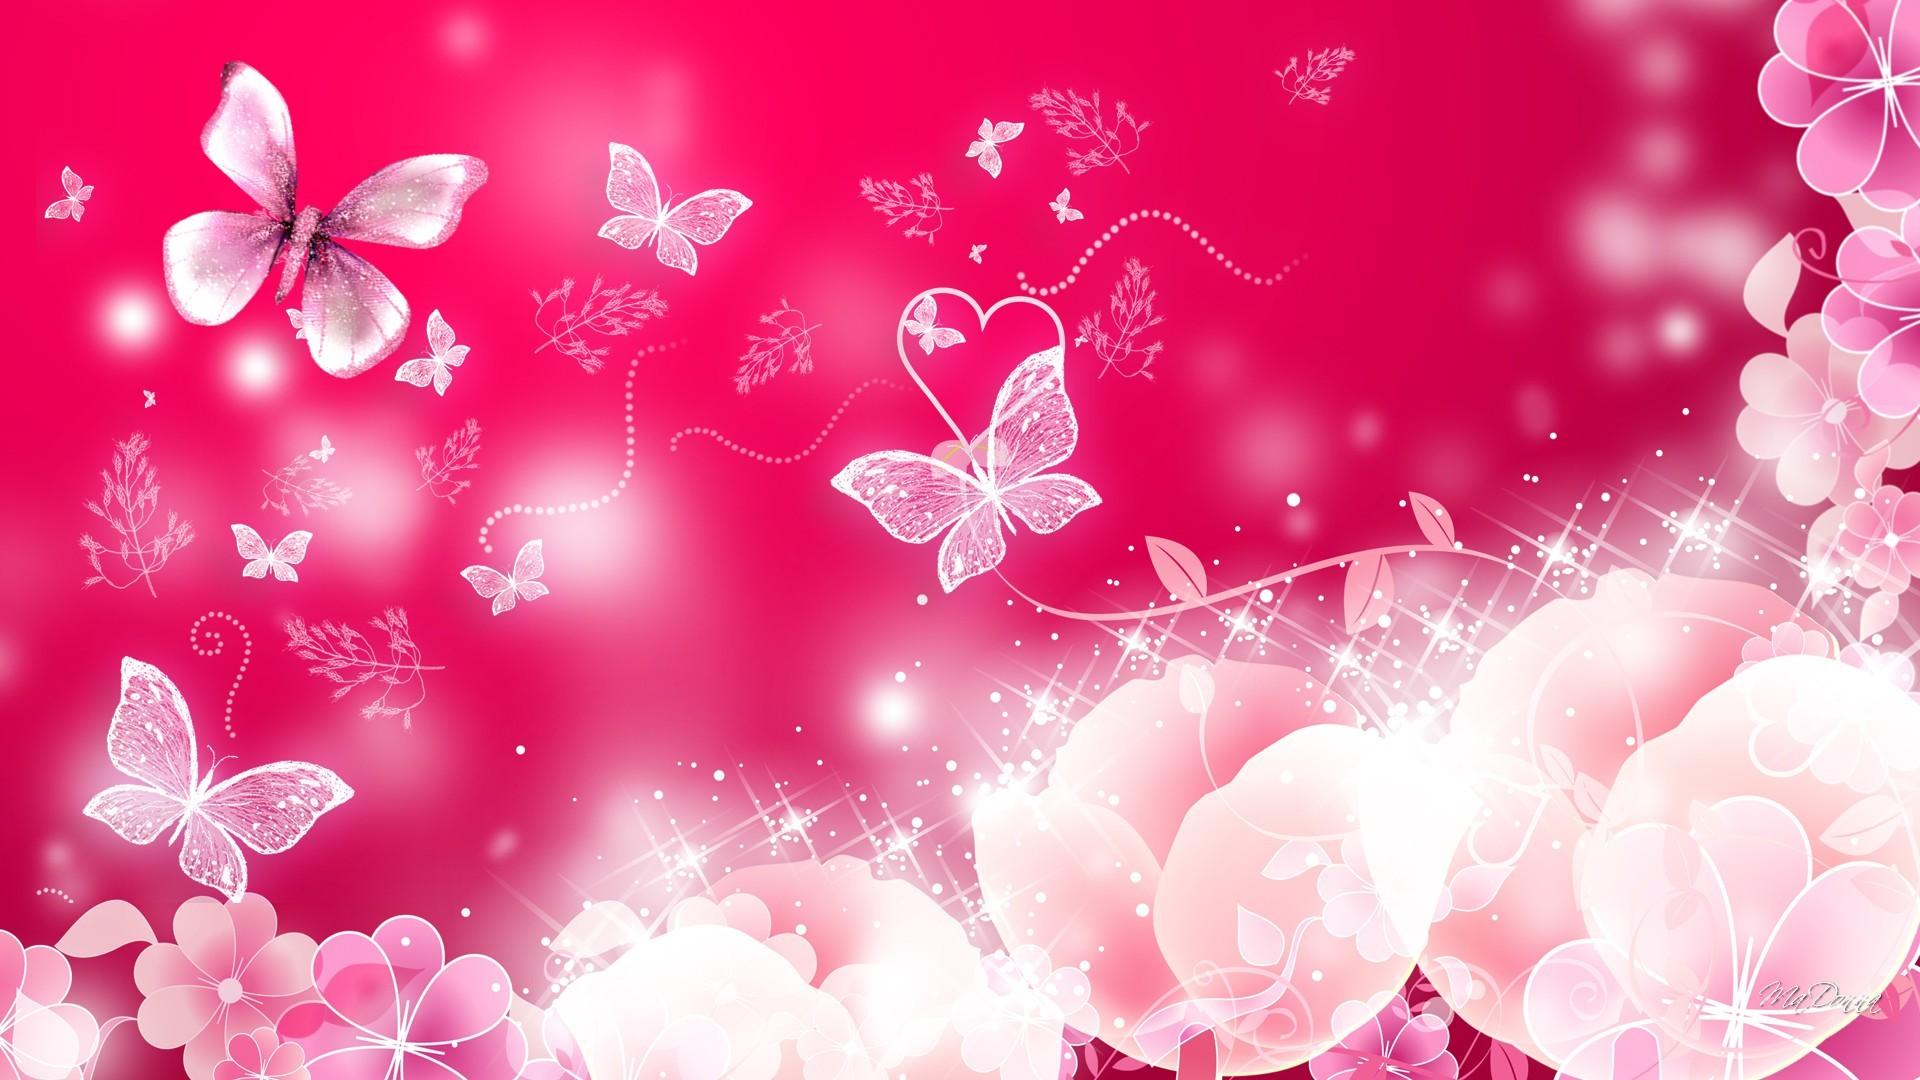 Neon Butterfly Live Wallpaper - Pink Beautiful Wallpaper Butterfly - HD Wallpaper